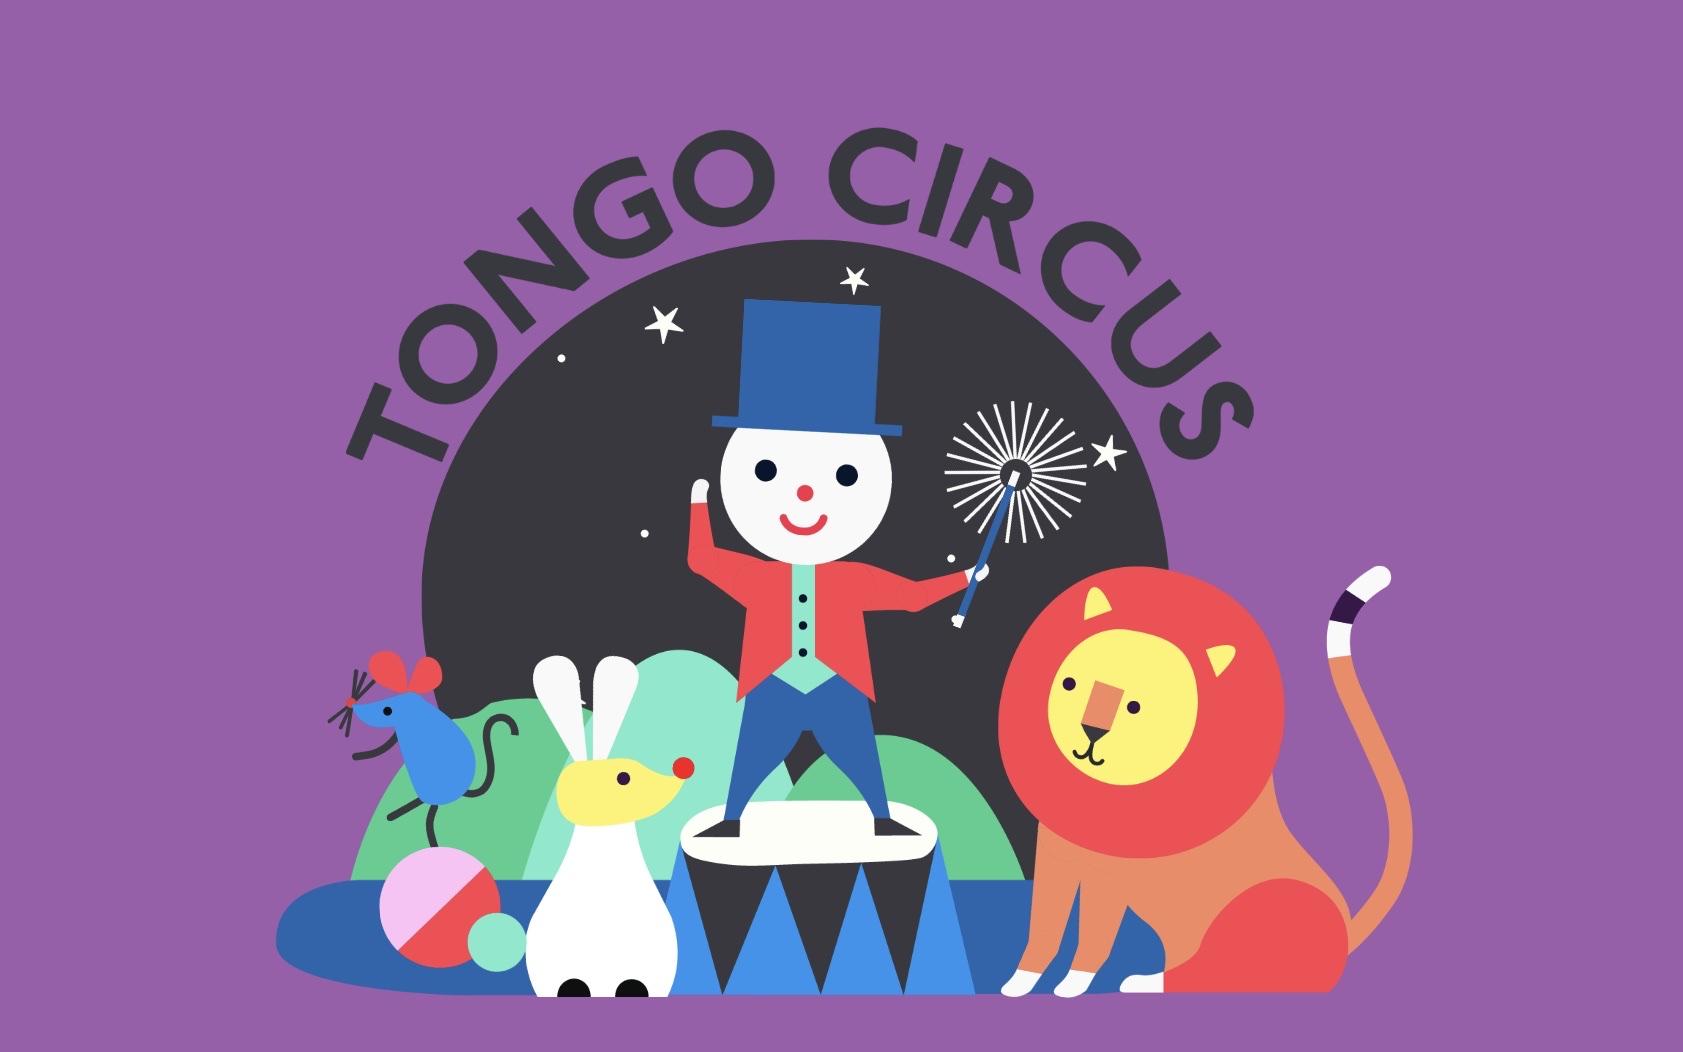 Tongo Circus peli taaperolle